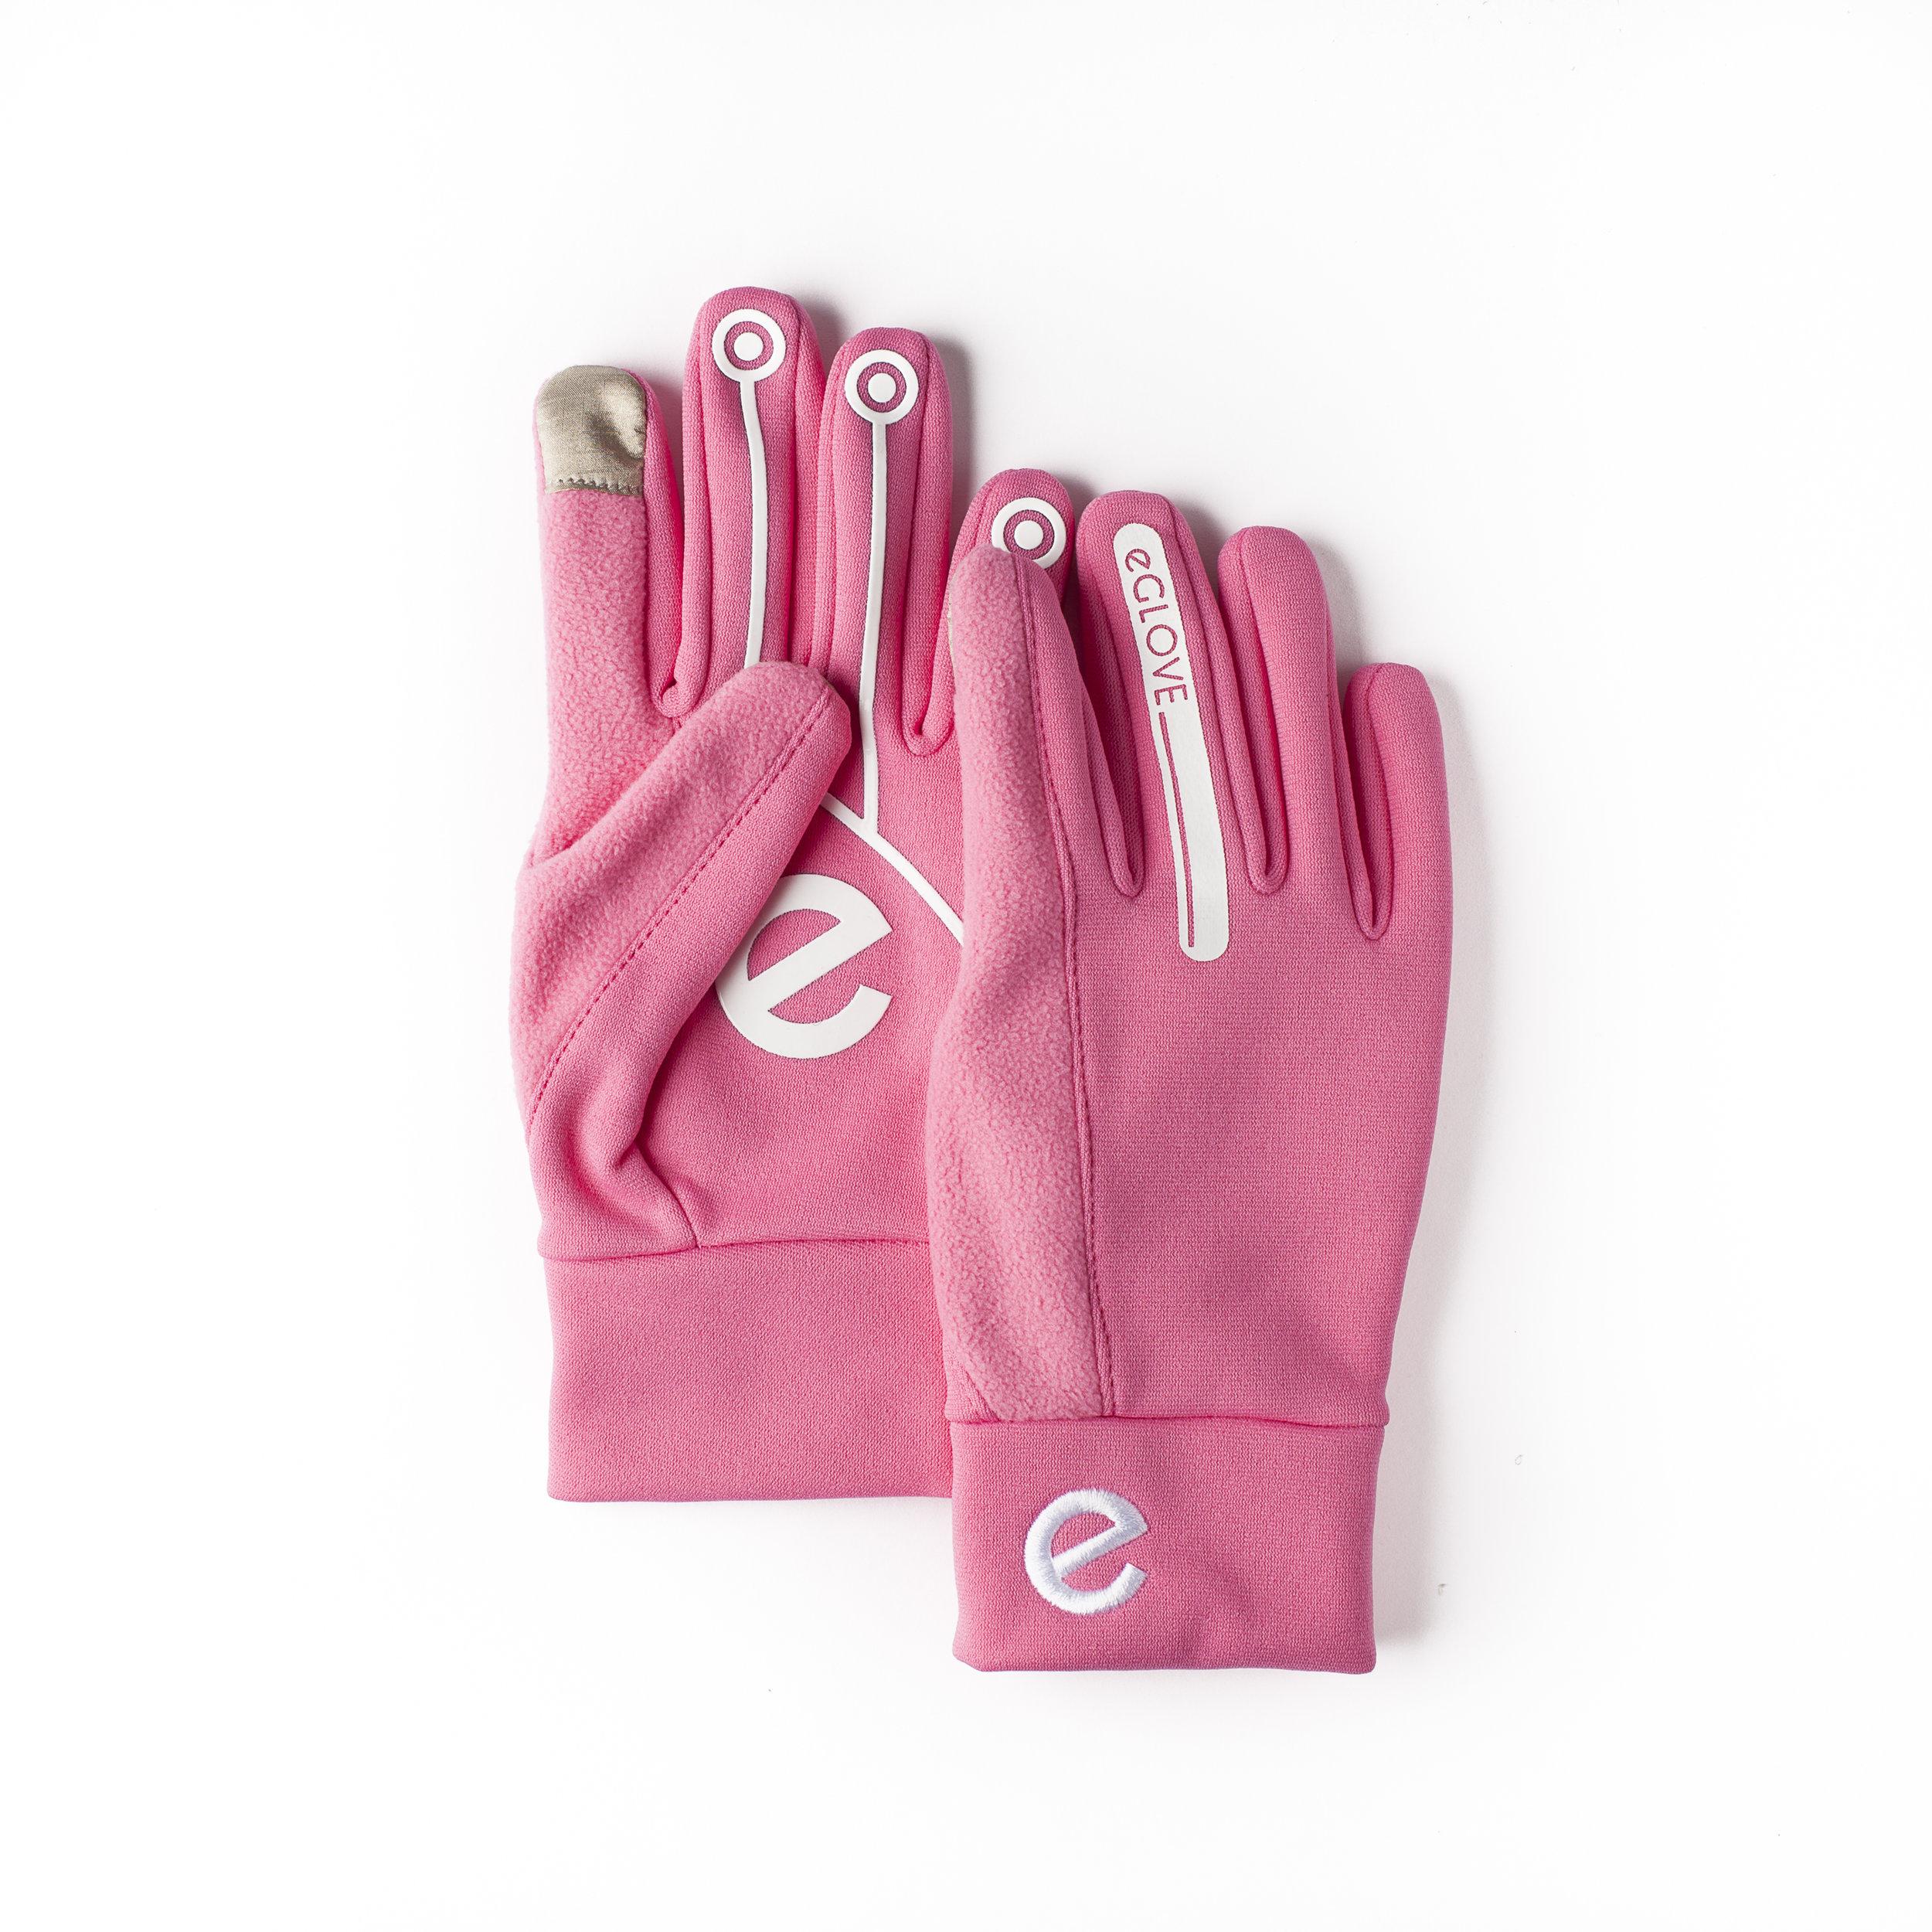 e-glove-xtreme Pink.jpg